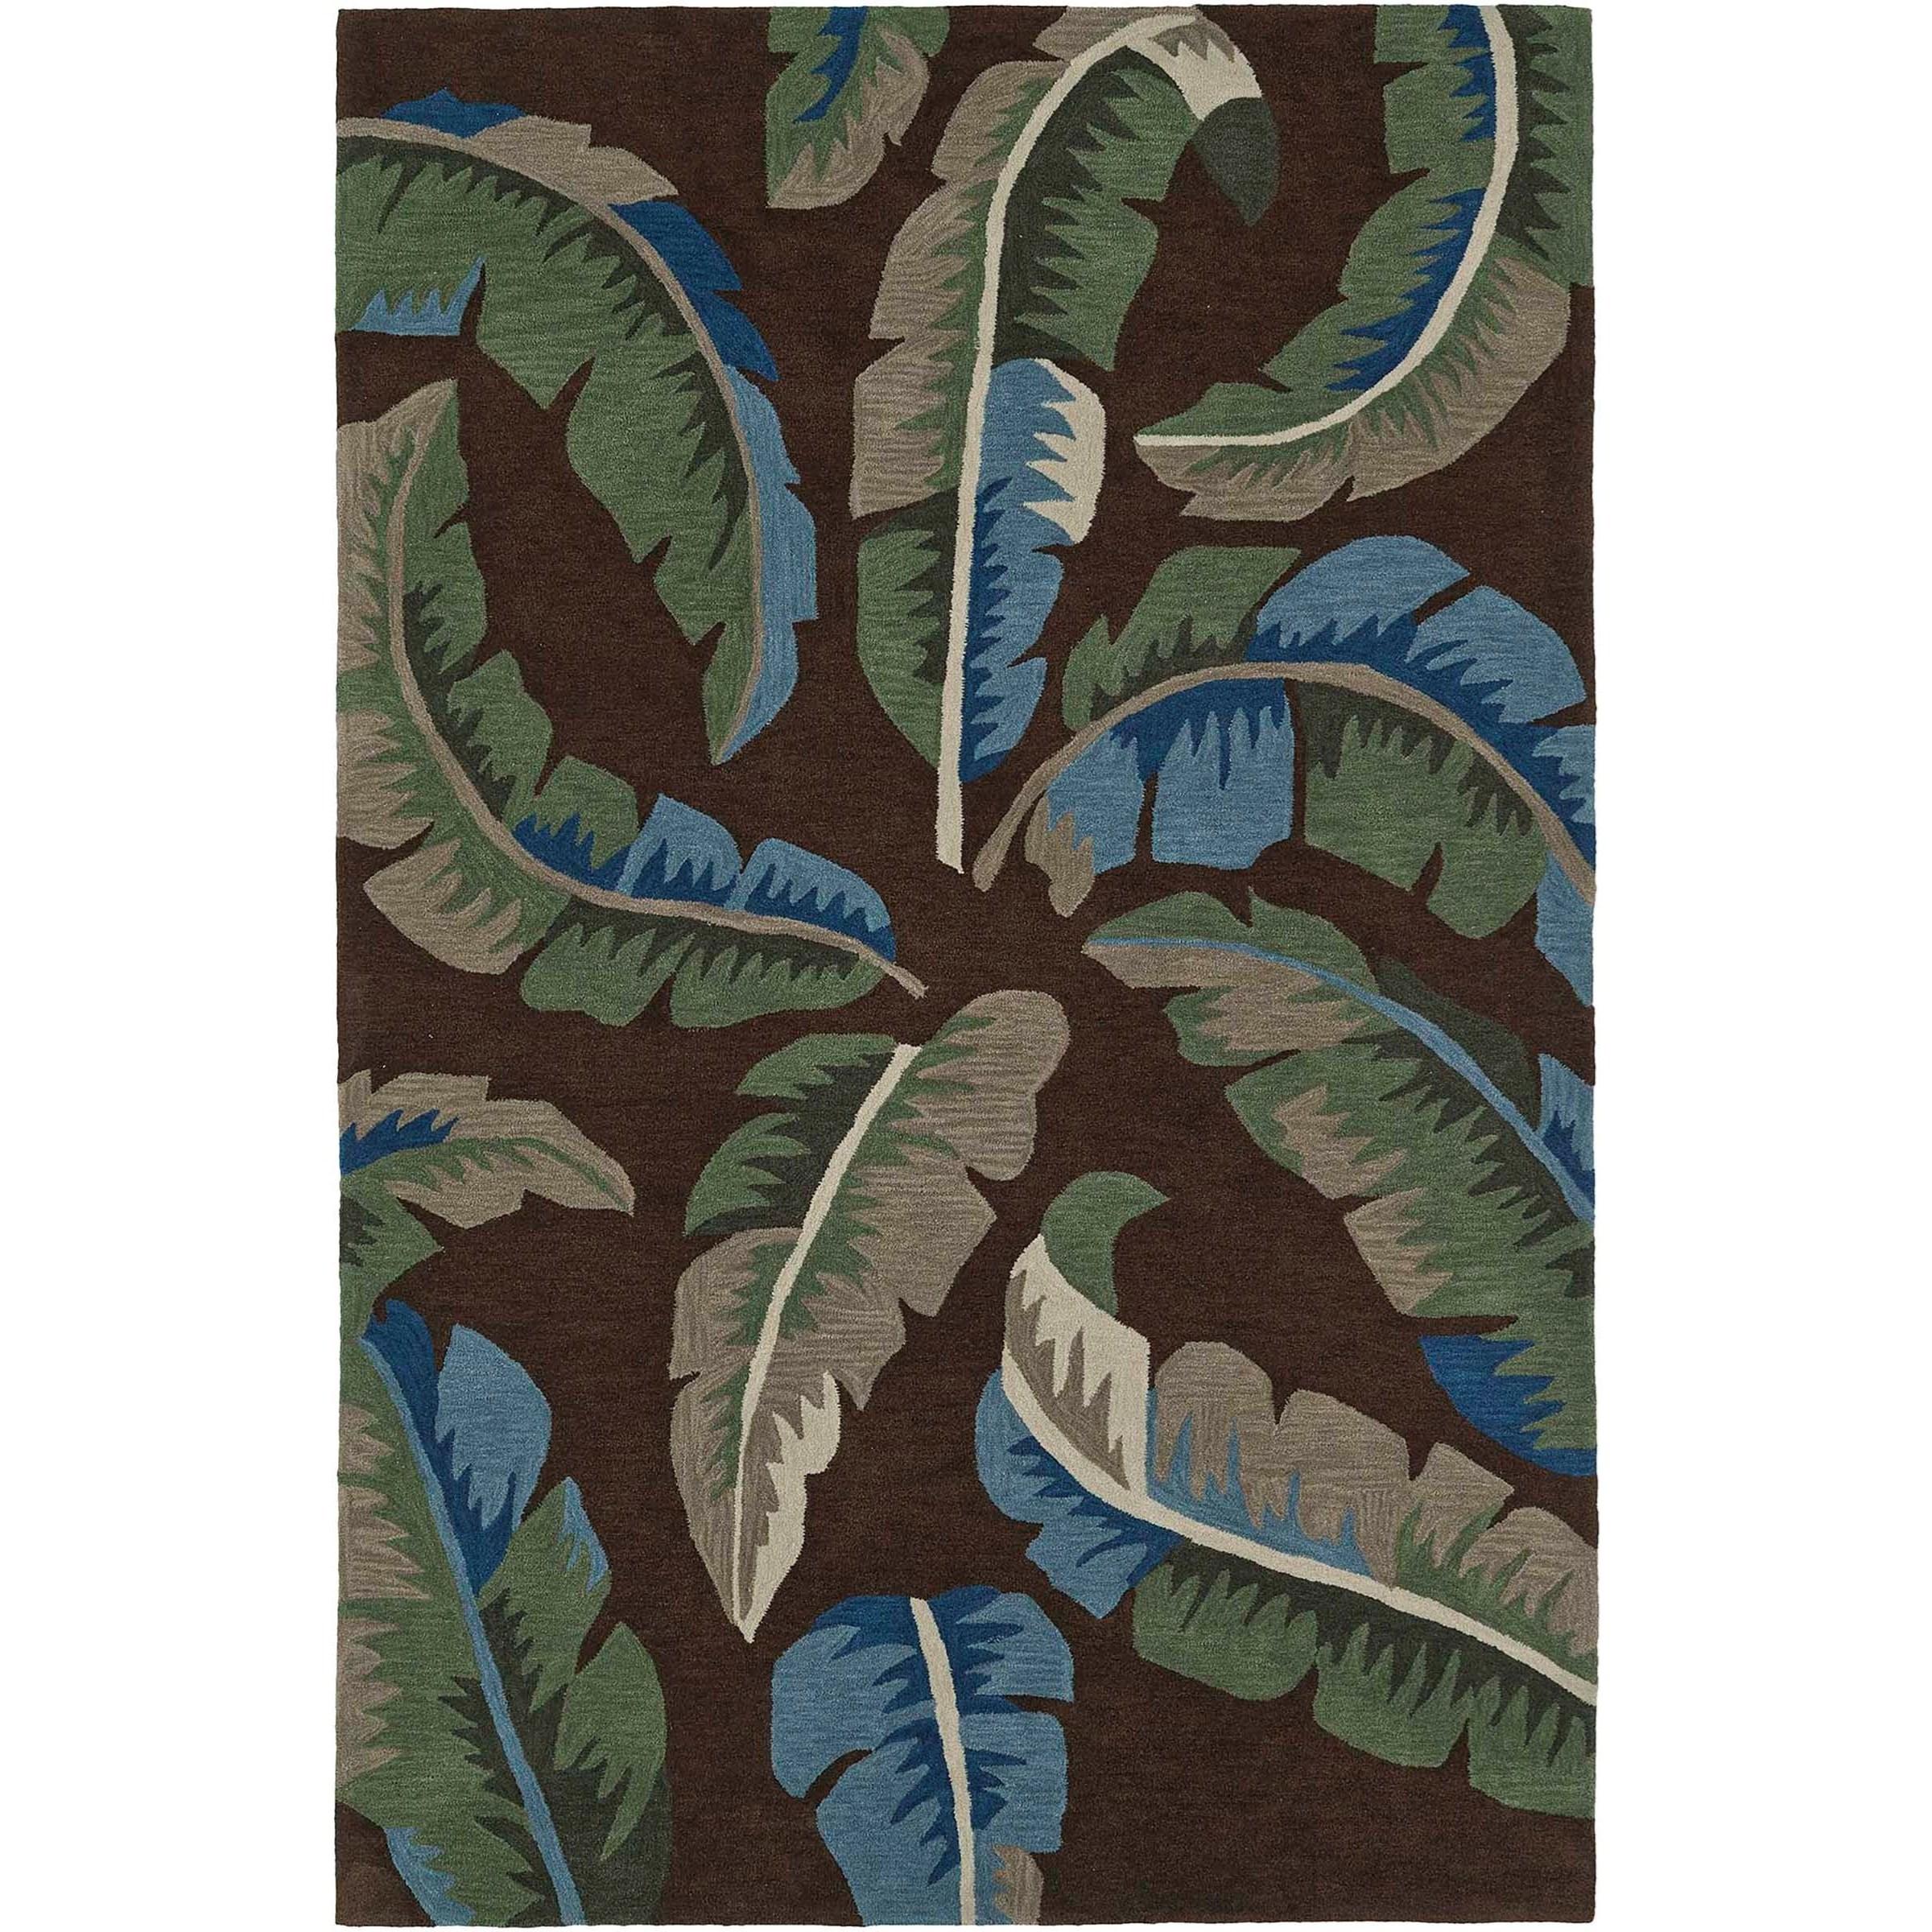 "Maui Chocolate 5'X7'6"" Rug by Dalyn at Sadler's Home Furnishings"